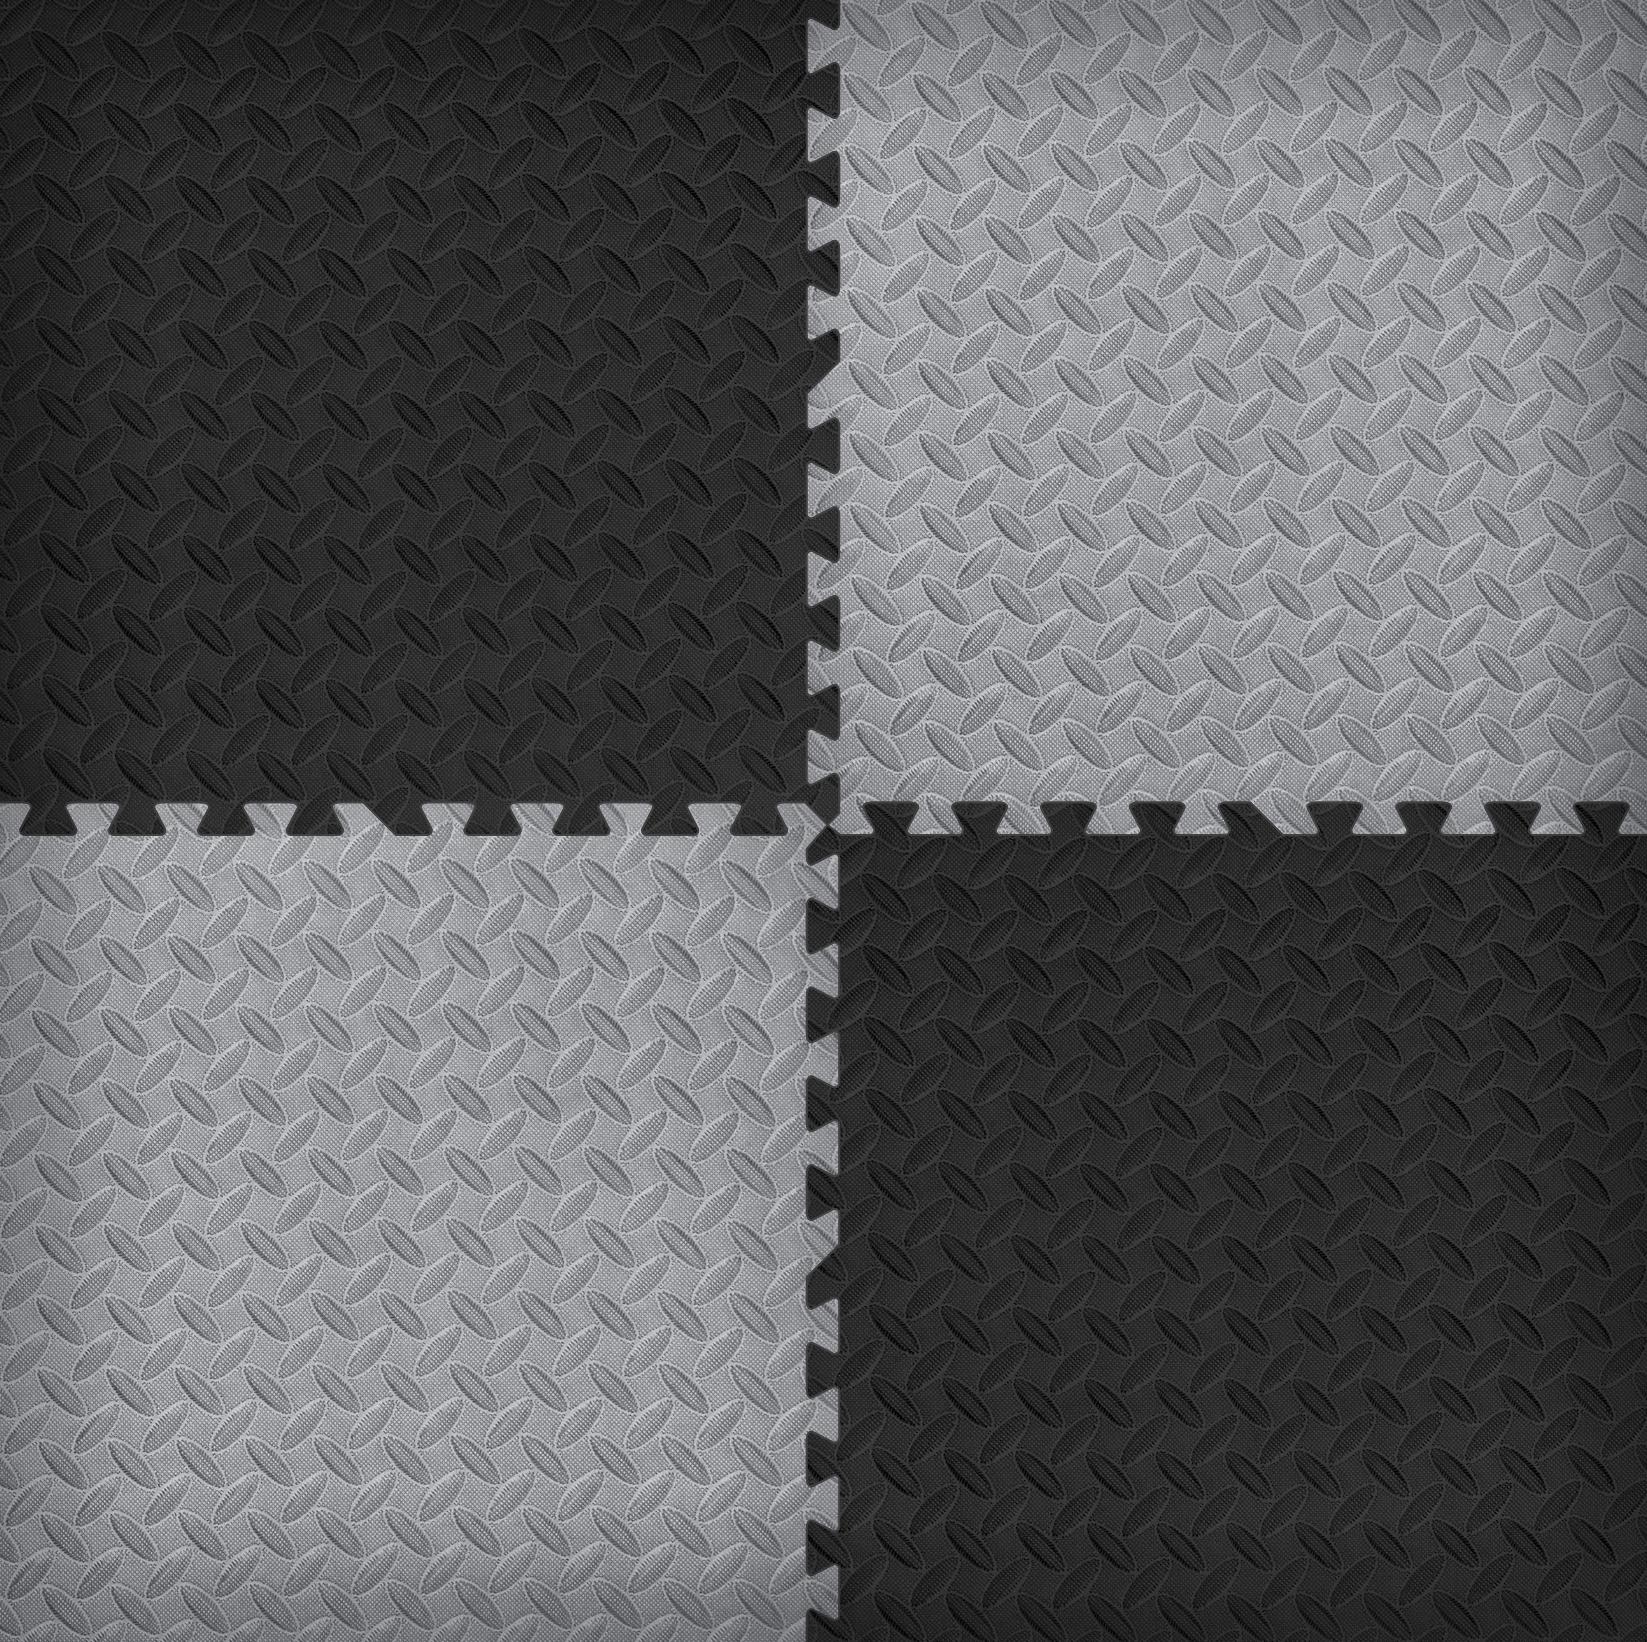 New Norsk Diamond Plate Foam Floor Mats